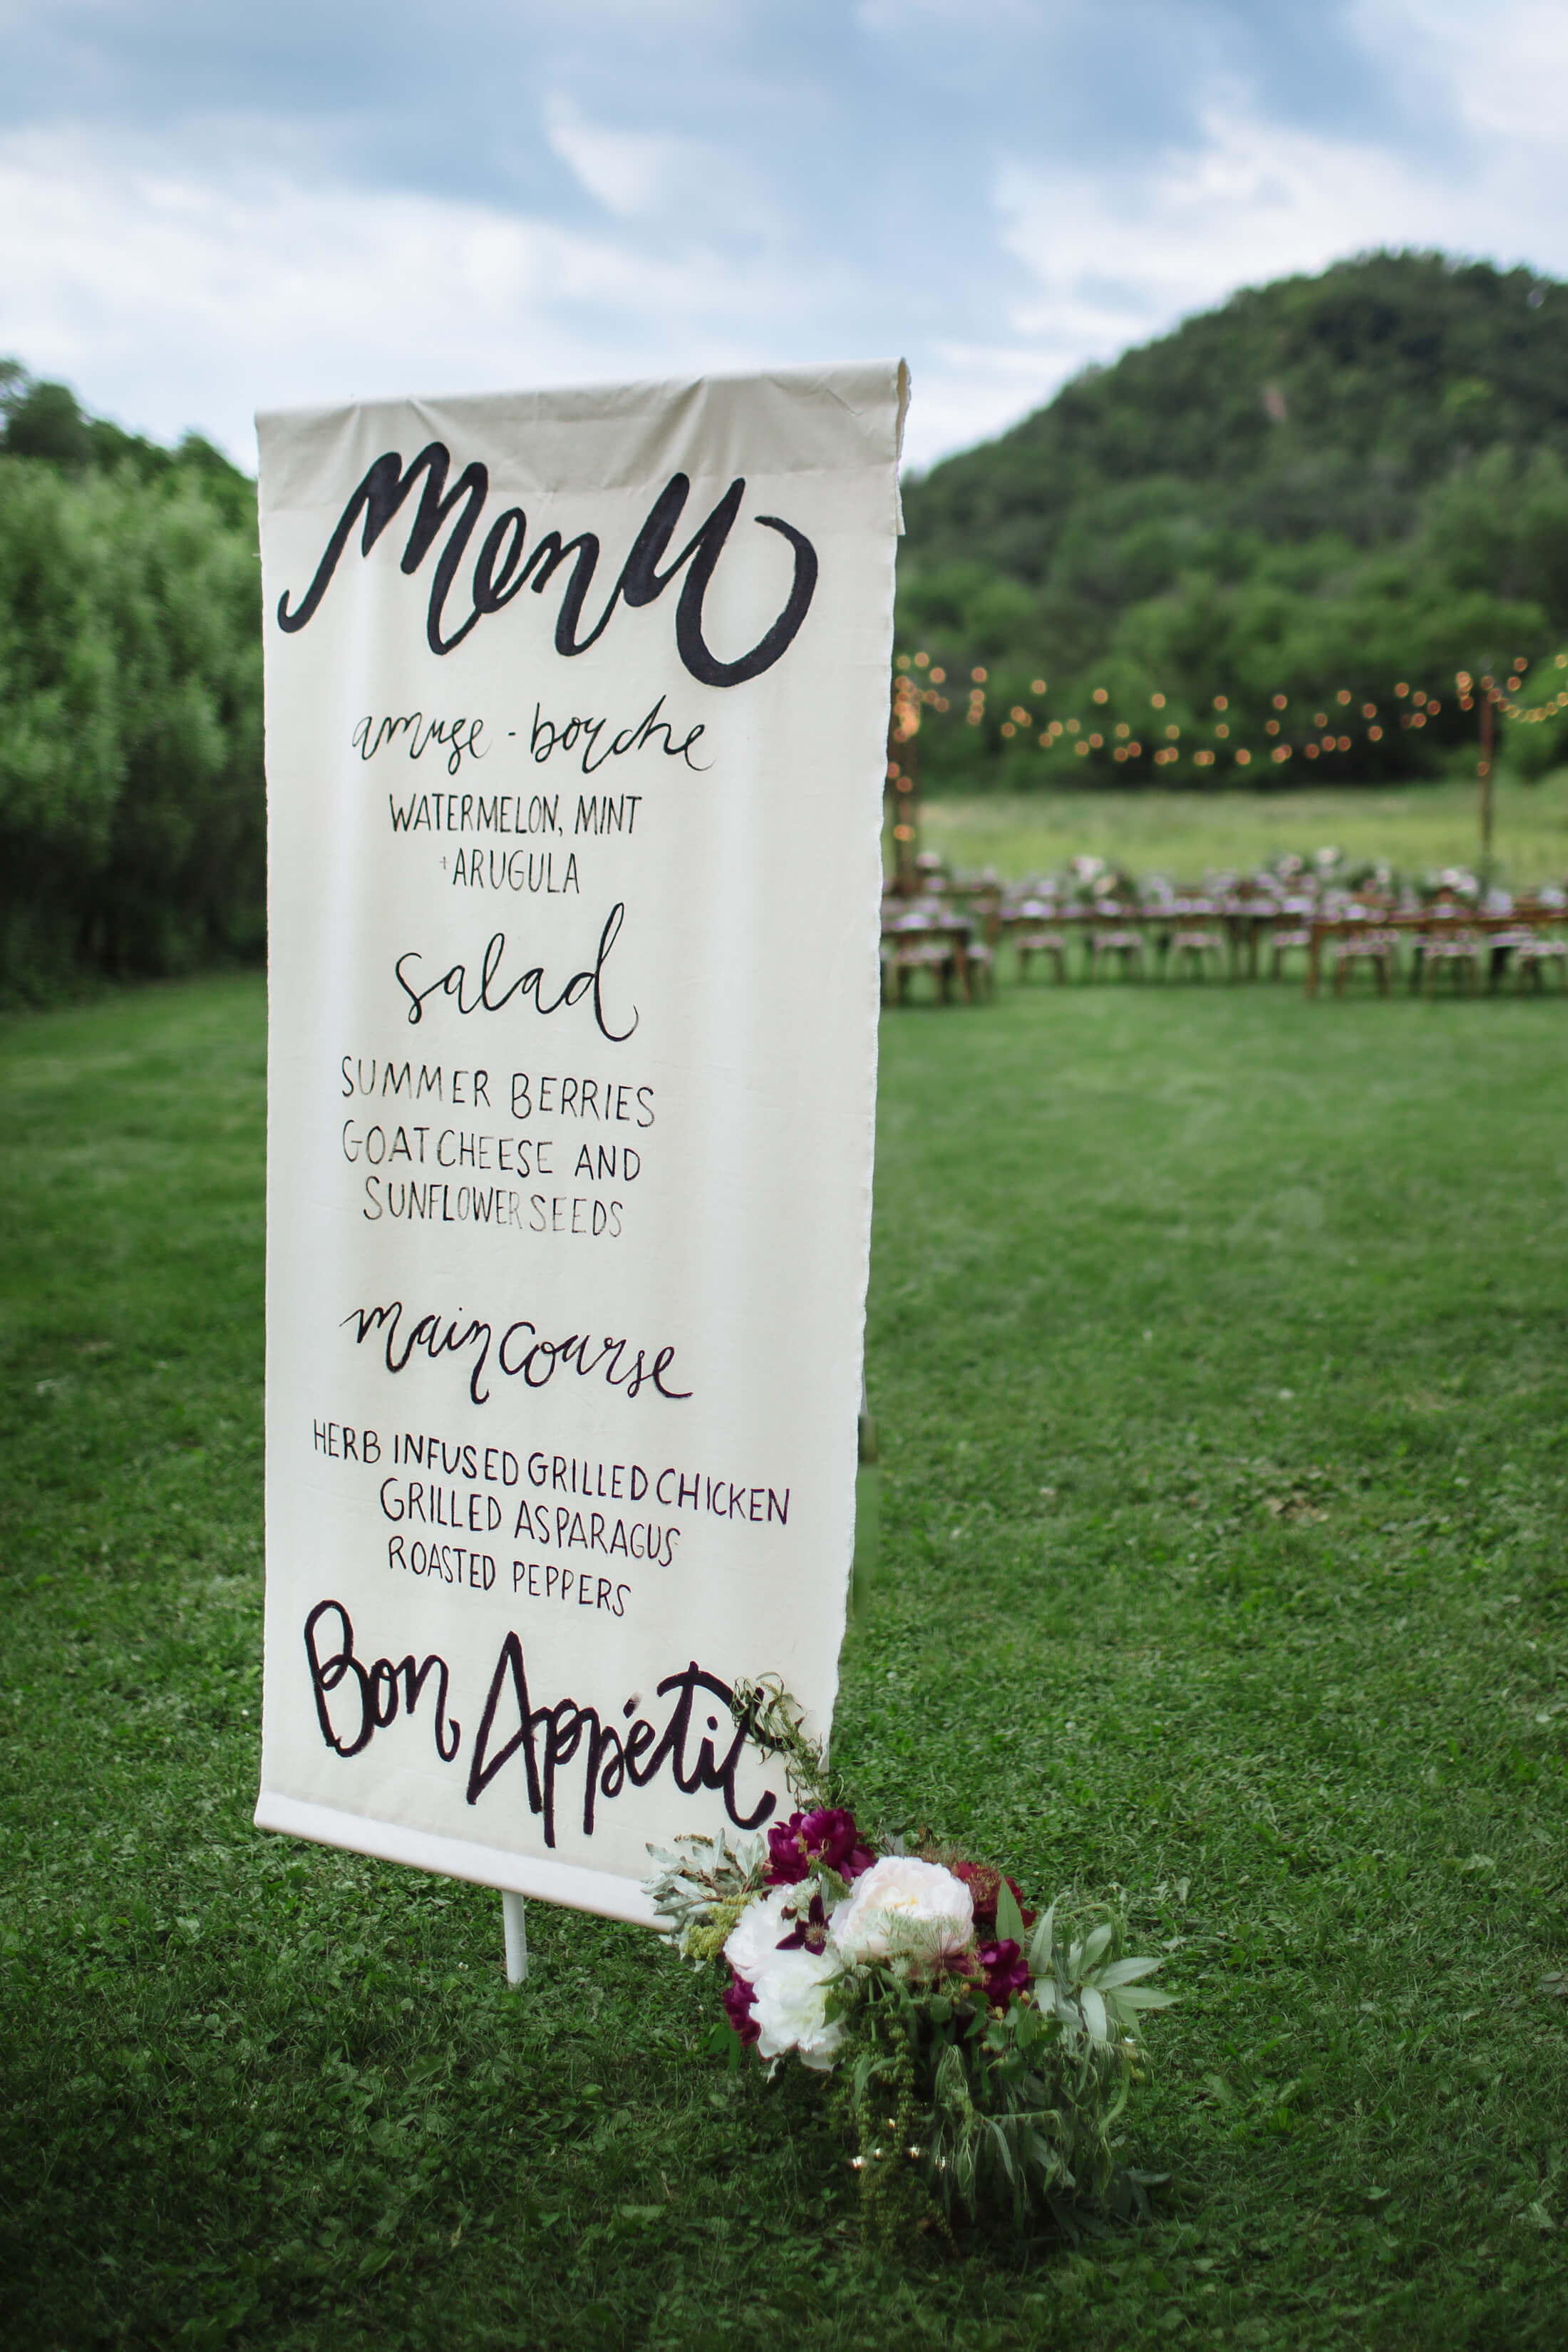 engle-olson-ray-kelly-photography-wisconsin-wedding-91.jpg